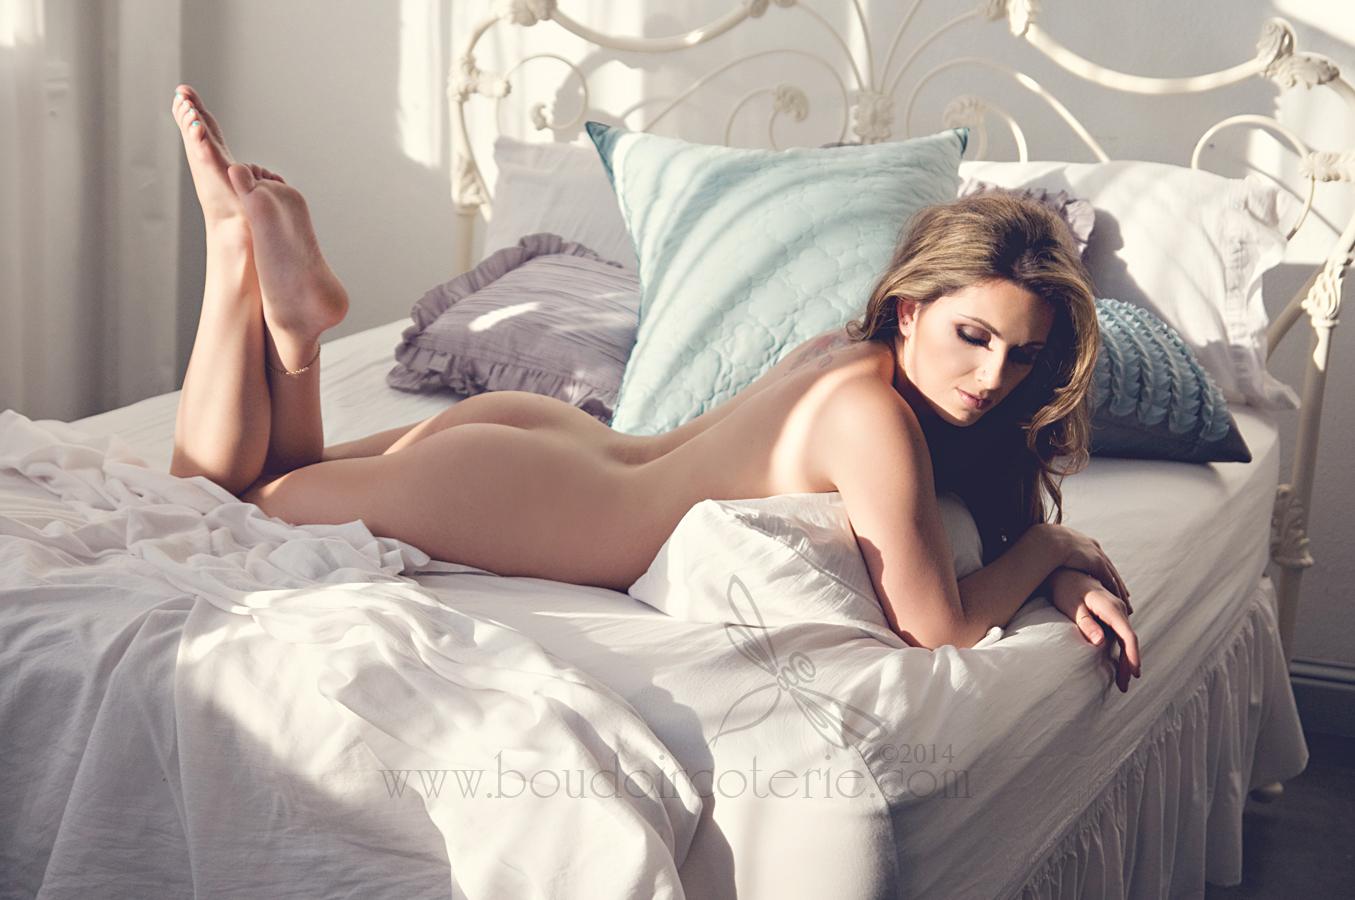 naked-sex-boudoir-photos